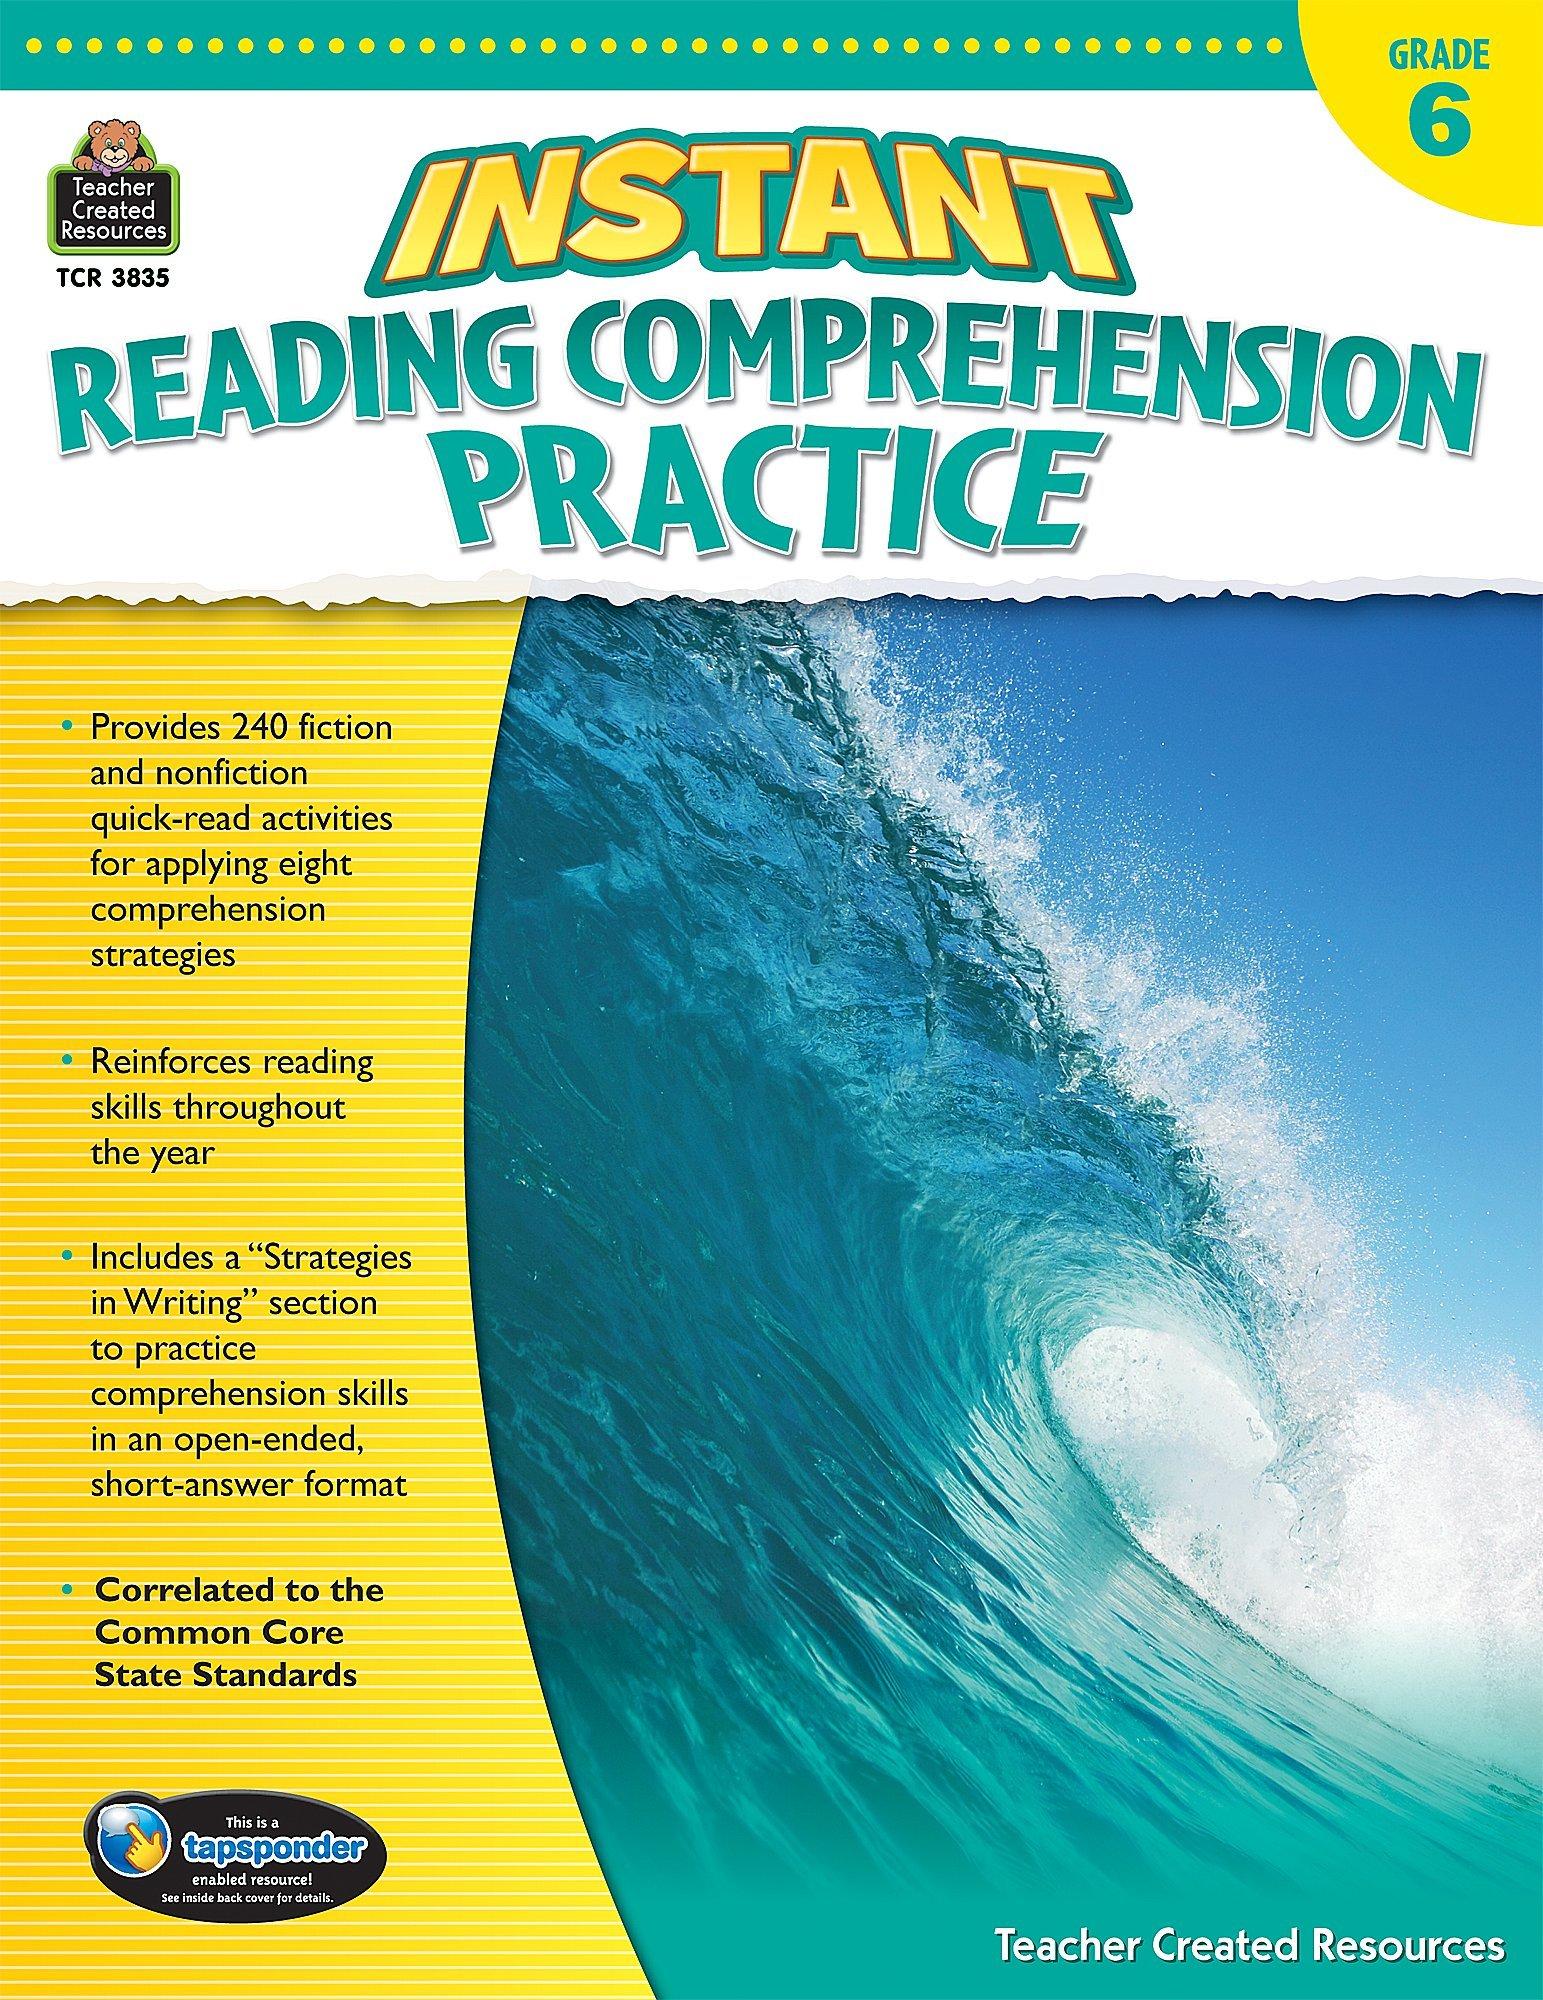 - Amazon.com: Instant Reading Comprehension Practice Grade 6